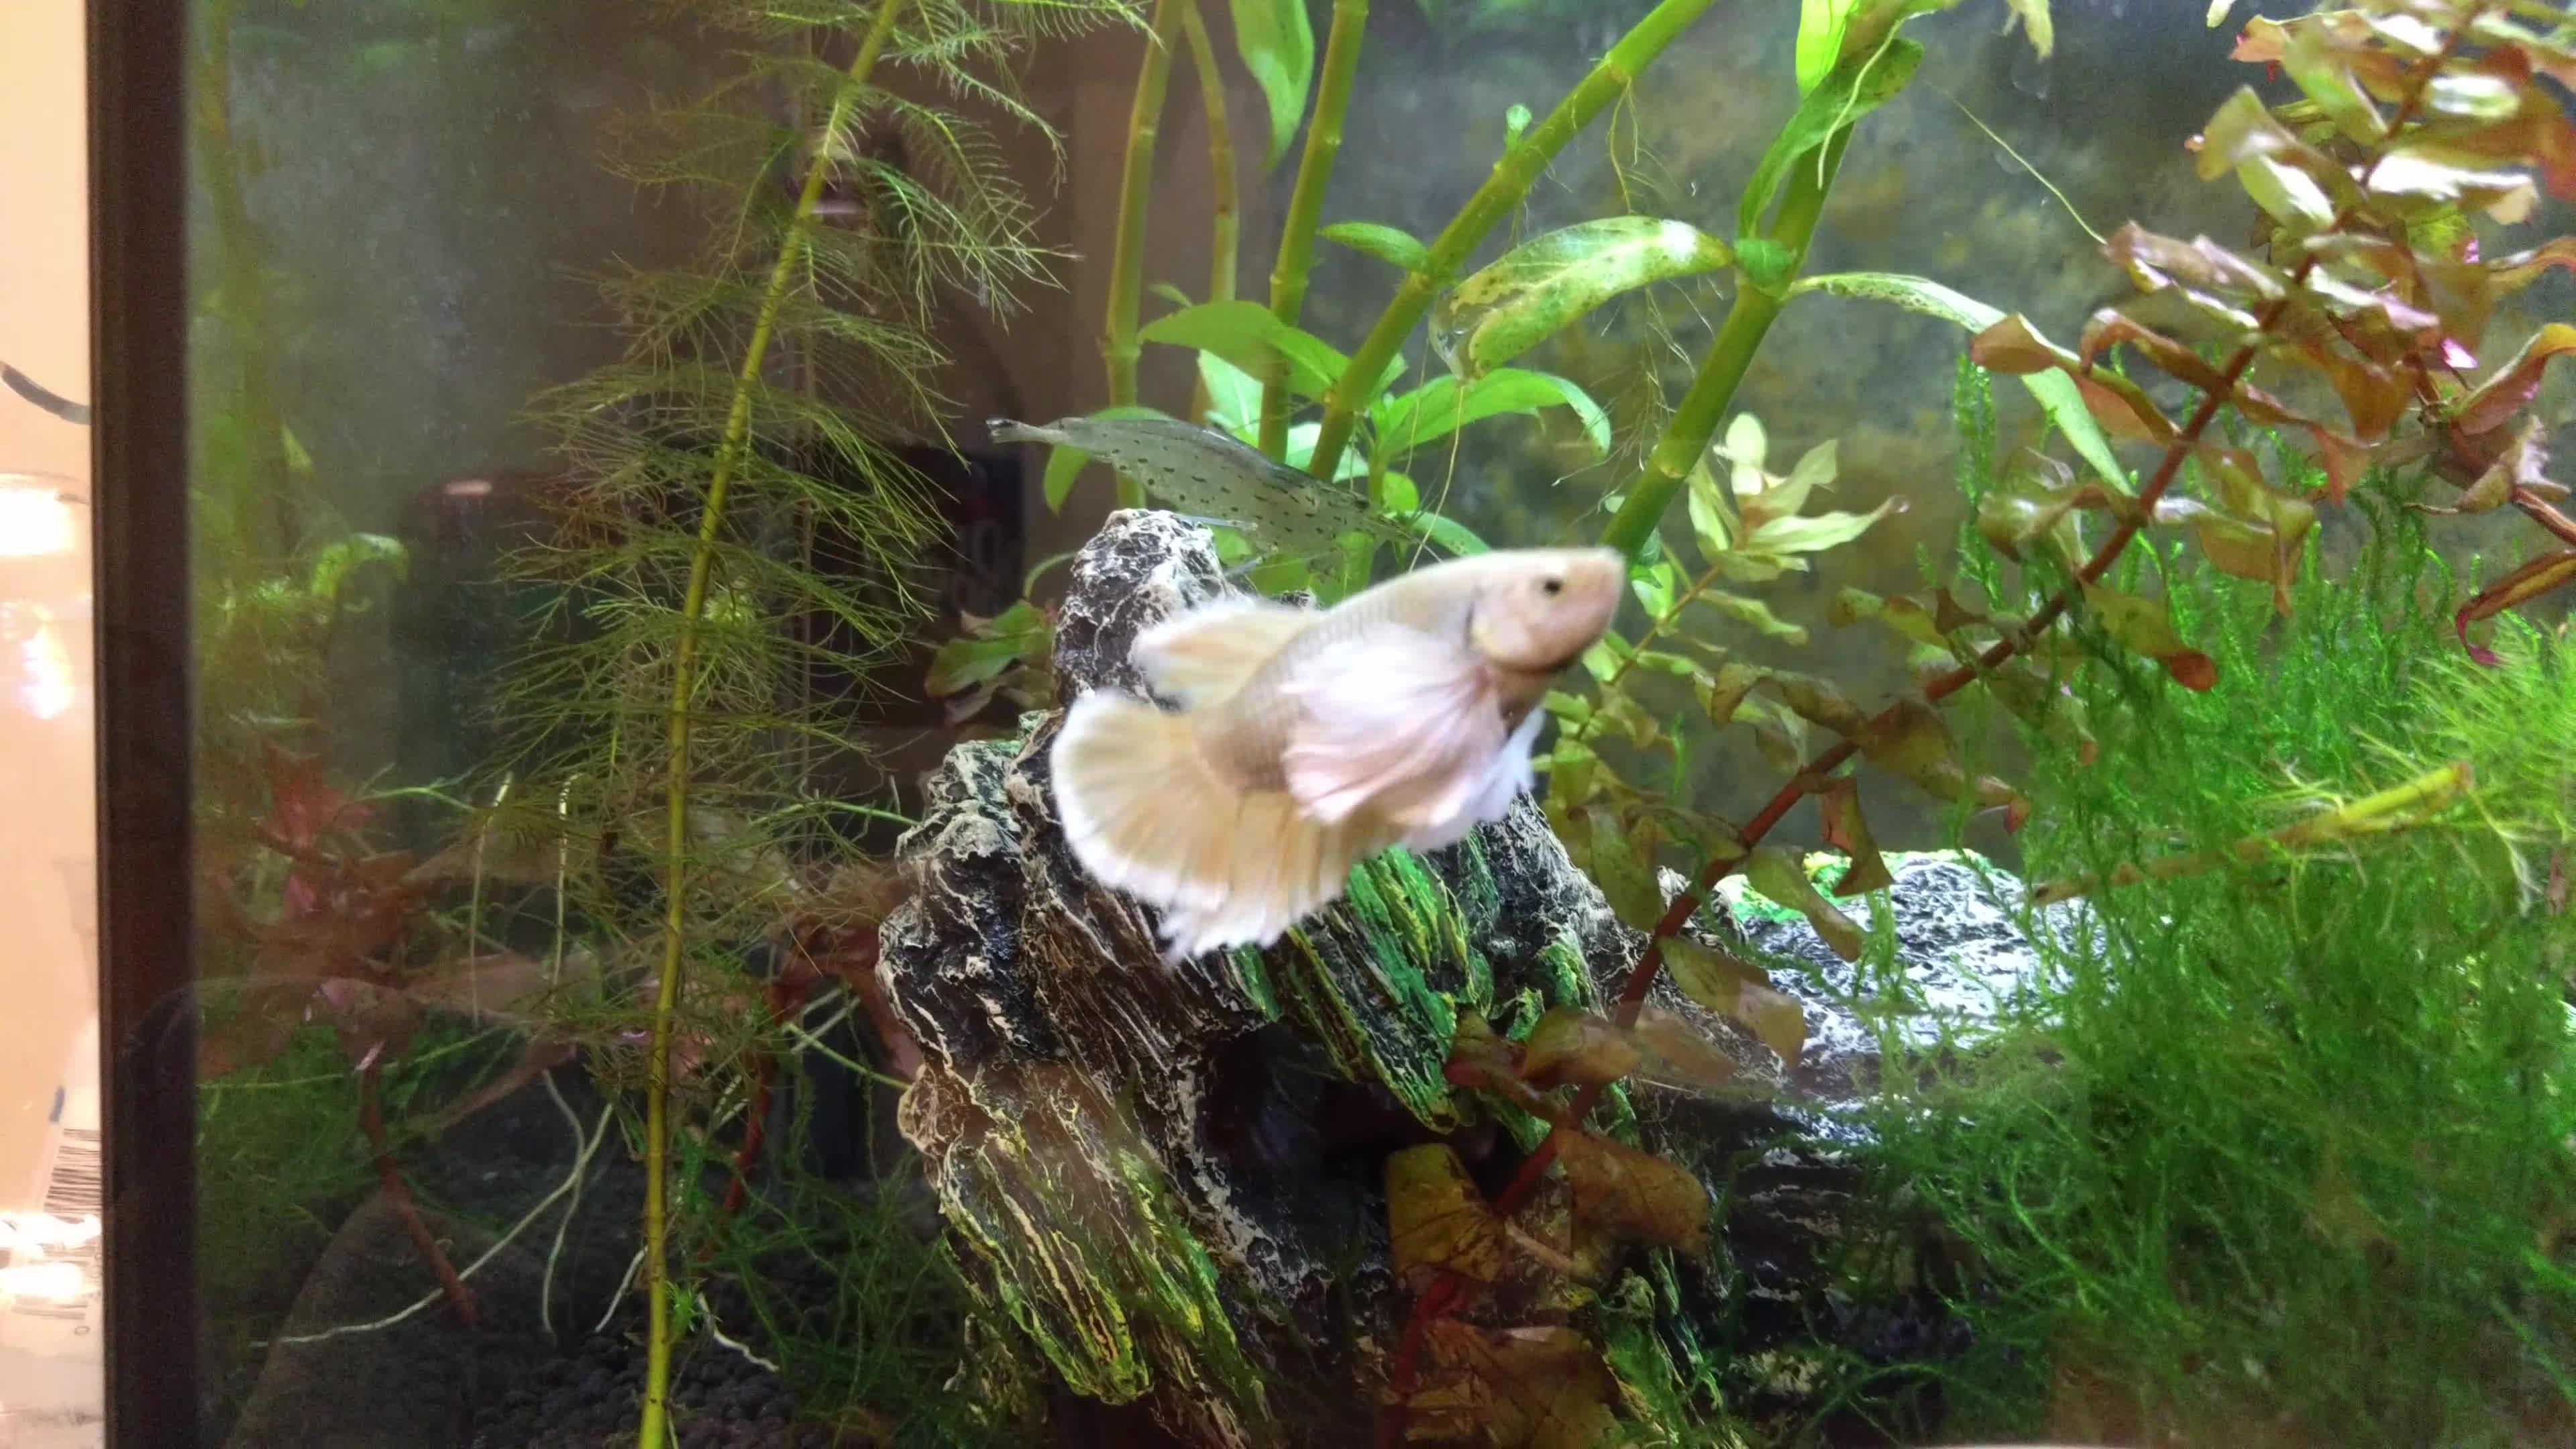 bettafish, Snow GIFs